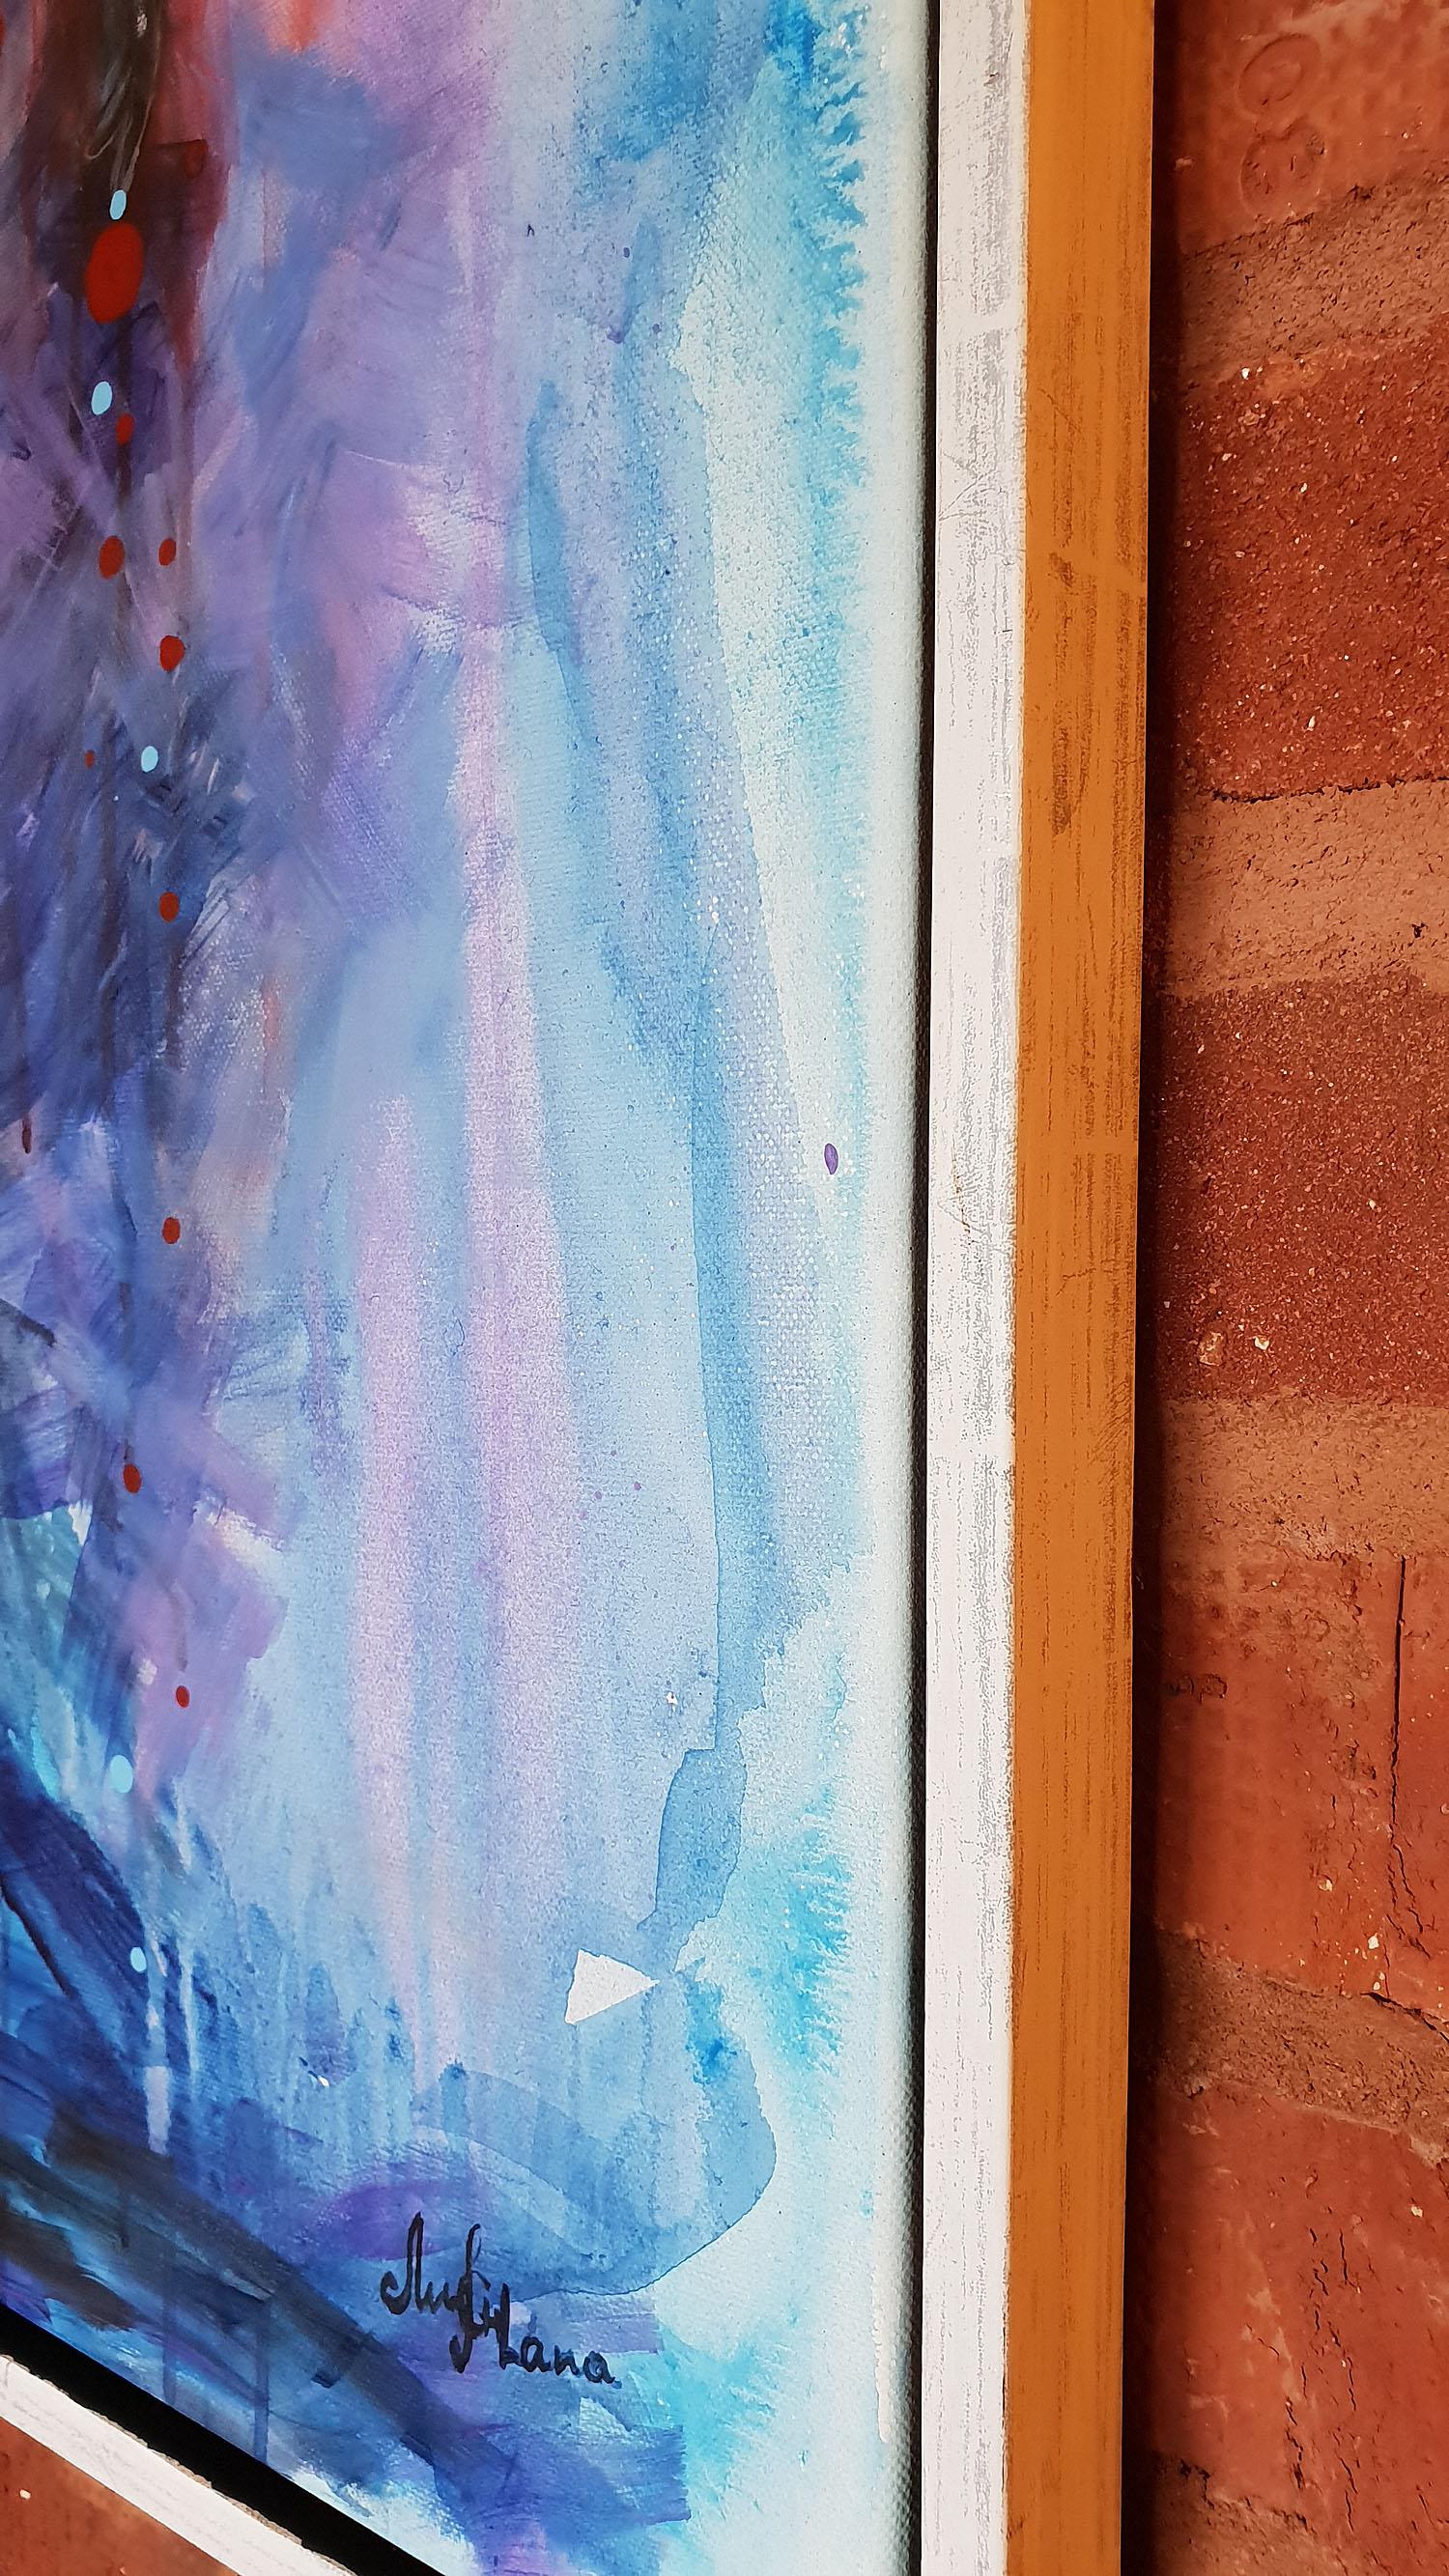 Dancing with a Stranger-painting-Lana Leuchuk-2